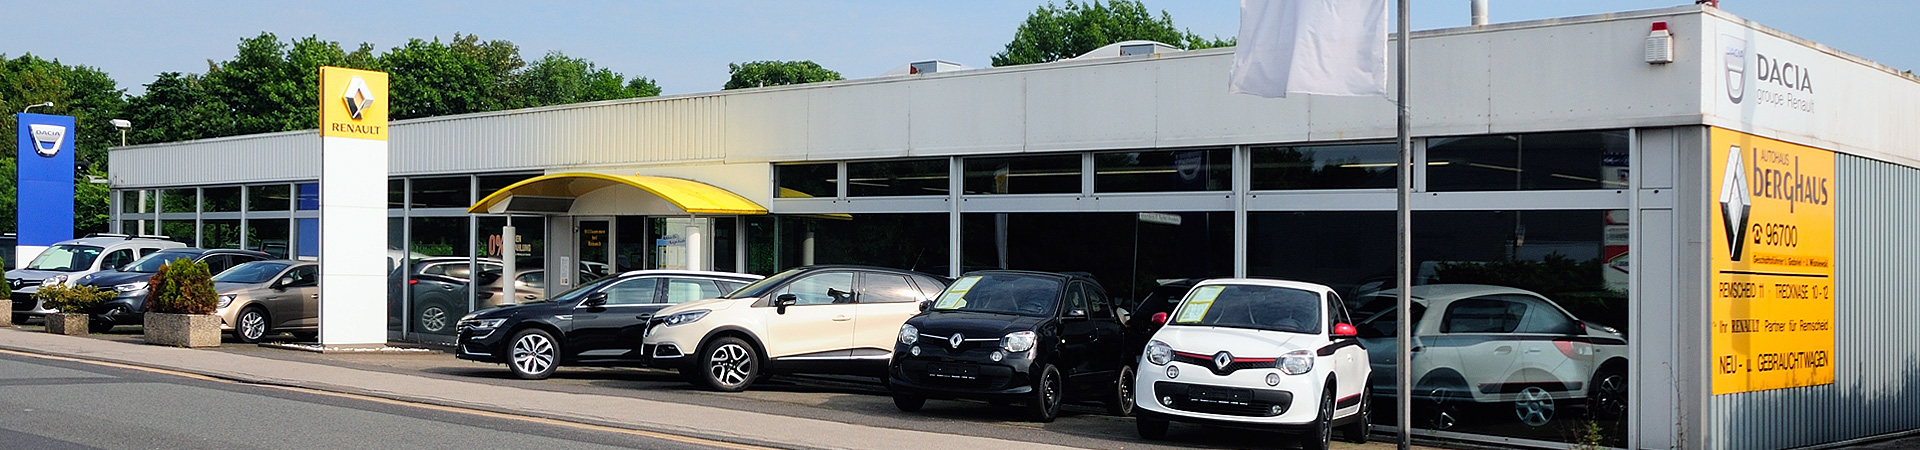 autohaus-berghaus-s1